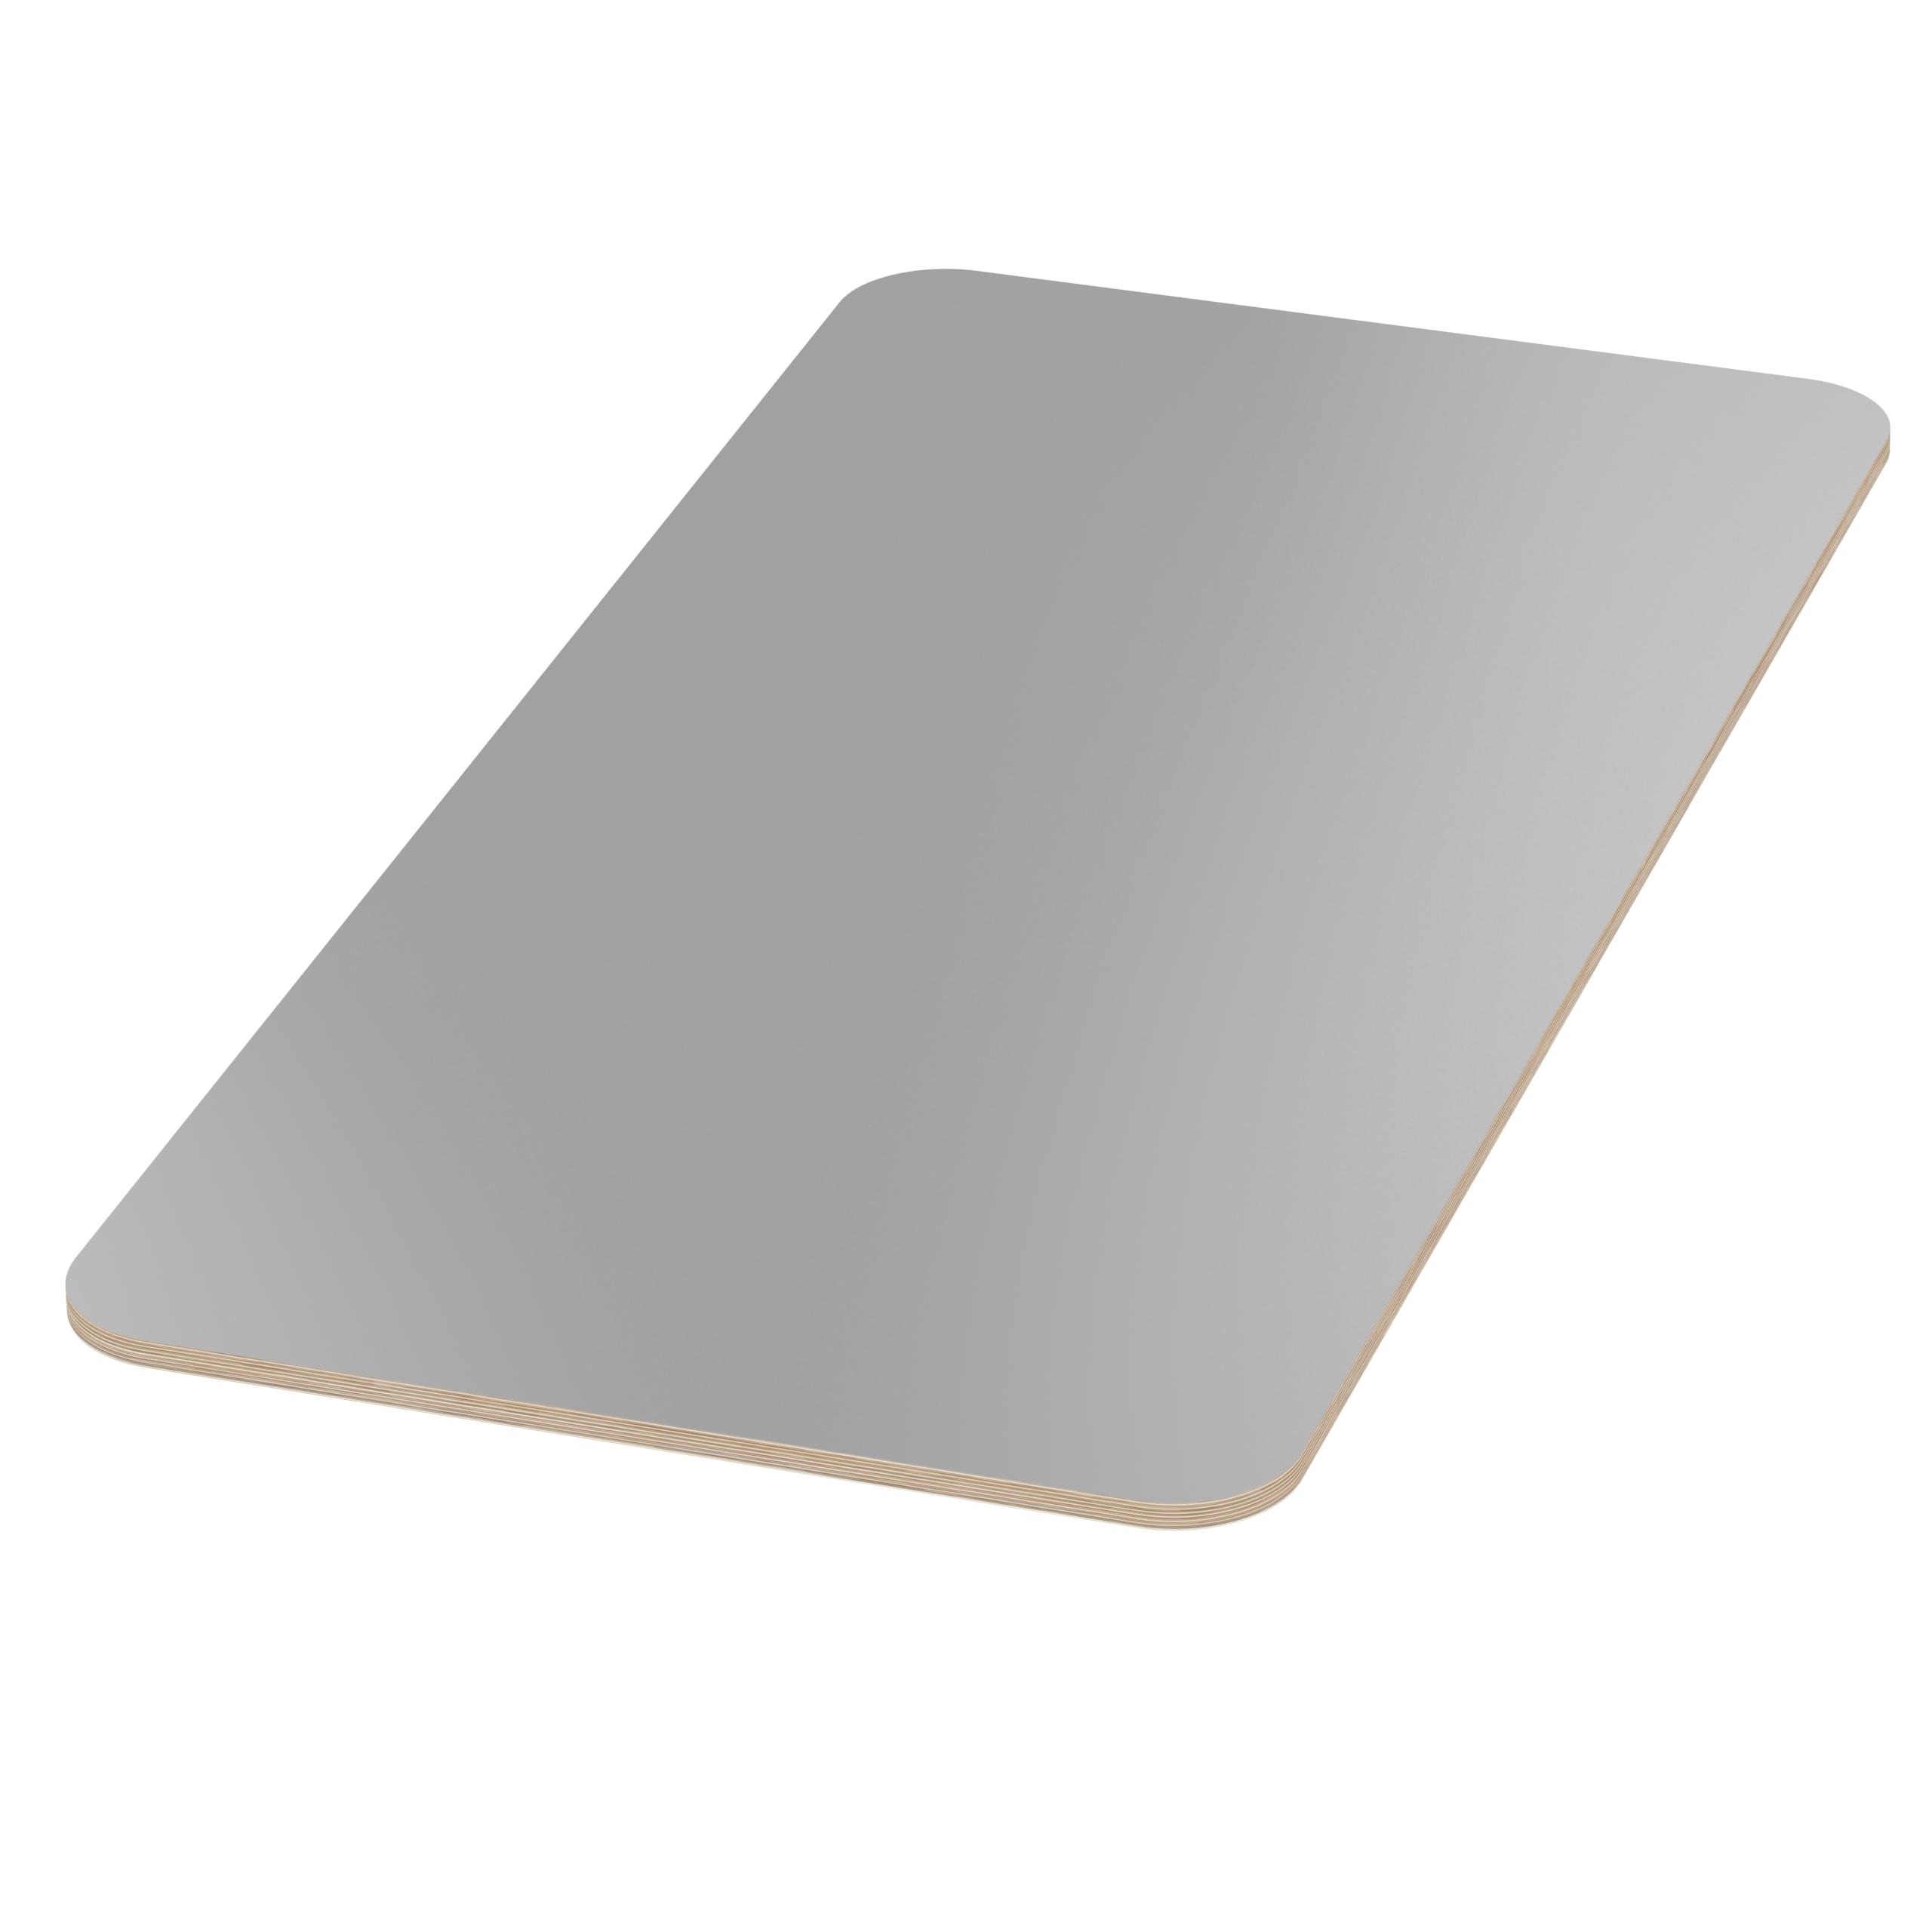 AUPROTEC 10x A4 Sperrholz-Platten Birke 10mm Multiplexplatten Klasse Industriequalit/ät 210 mm x 297 mm Bastel- und Laubs/äge-Holzplatten Birke Massiv Multiplex Holz 1